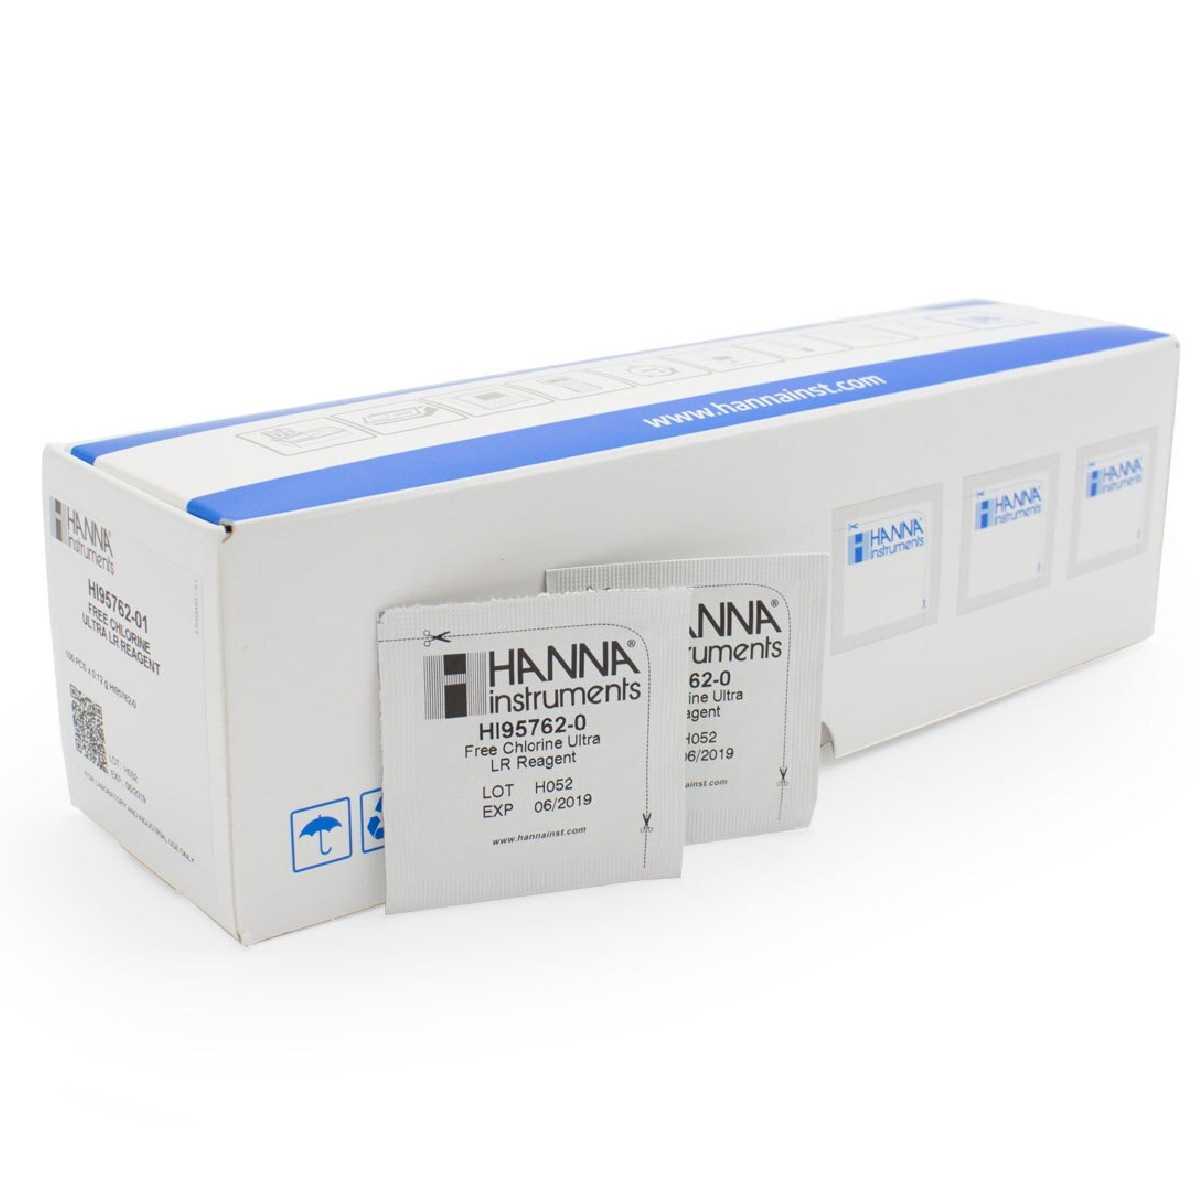 Free Chlorine Ultra Low Range Reagents (100 tests)